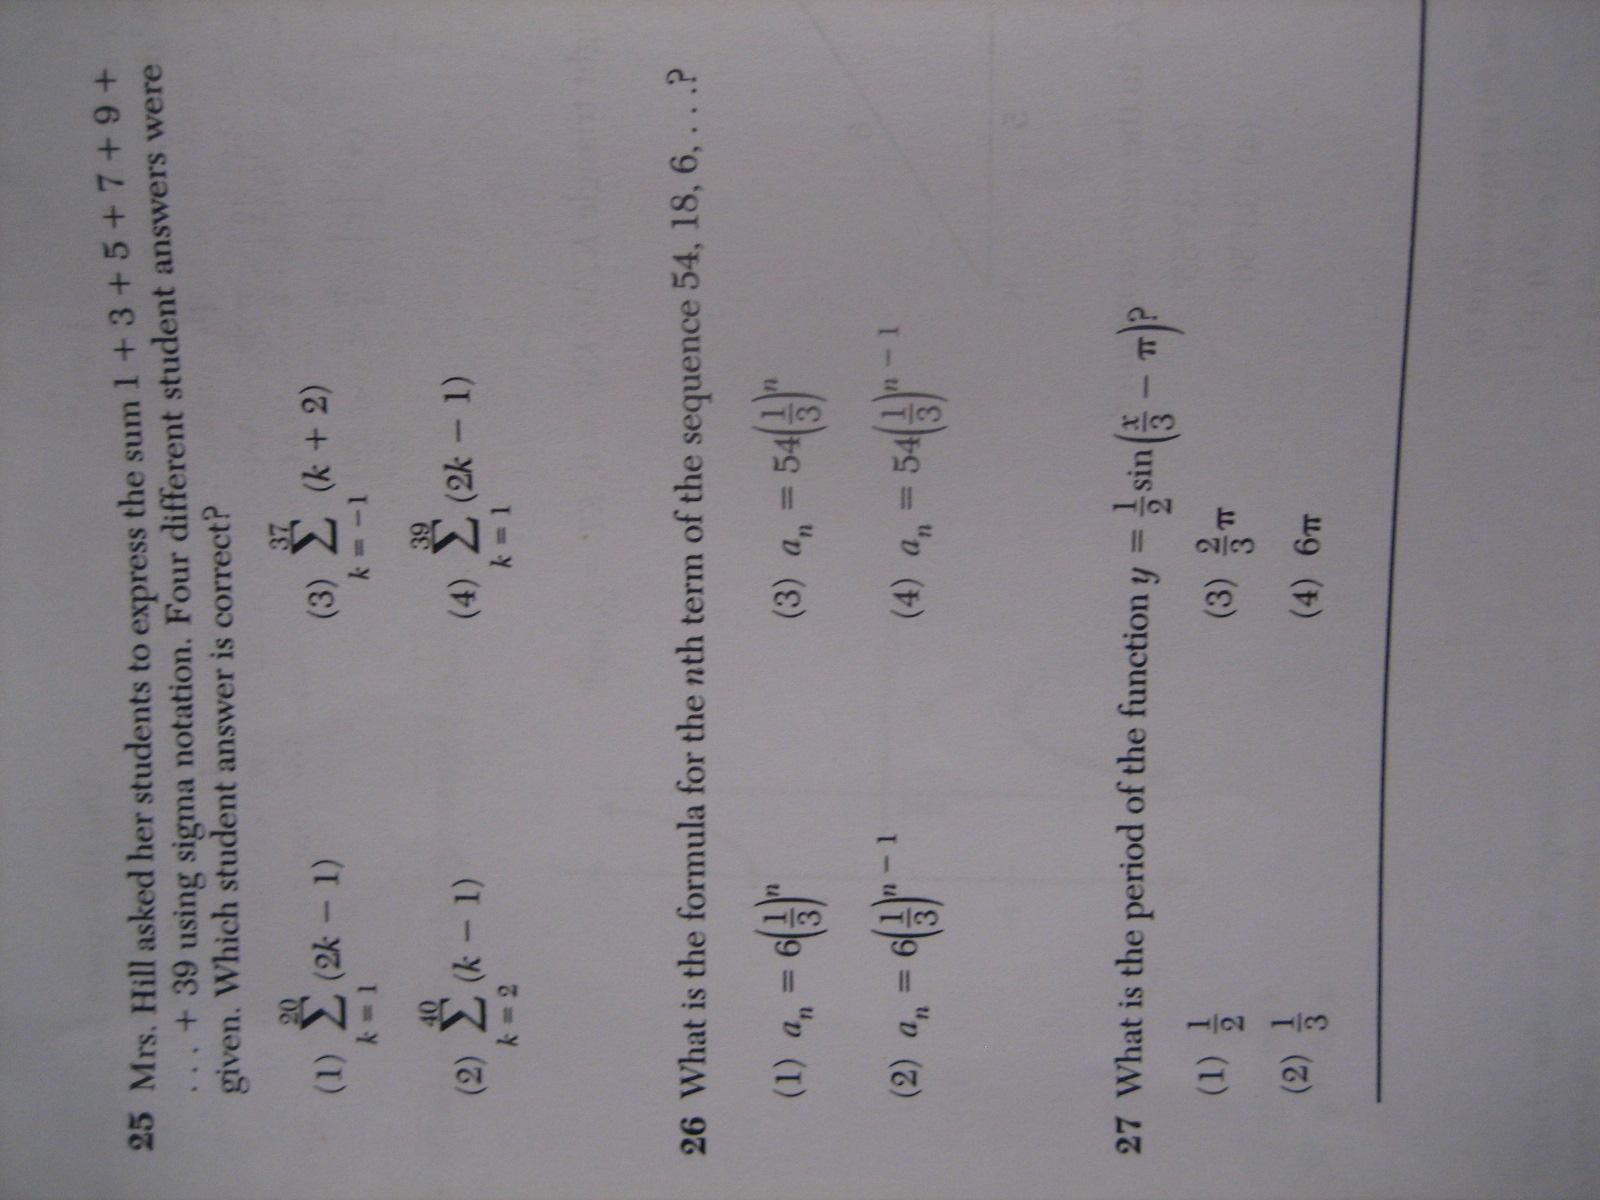 Algebra 2 trigonometry regents full list of multiple choice hi fandeluxe Images